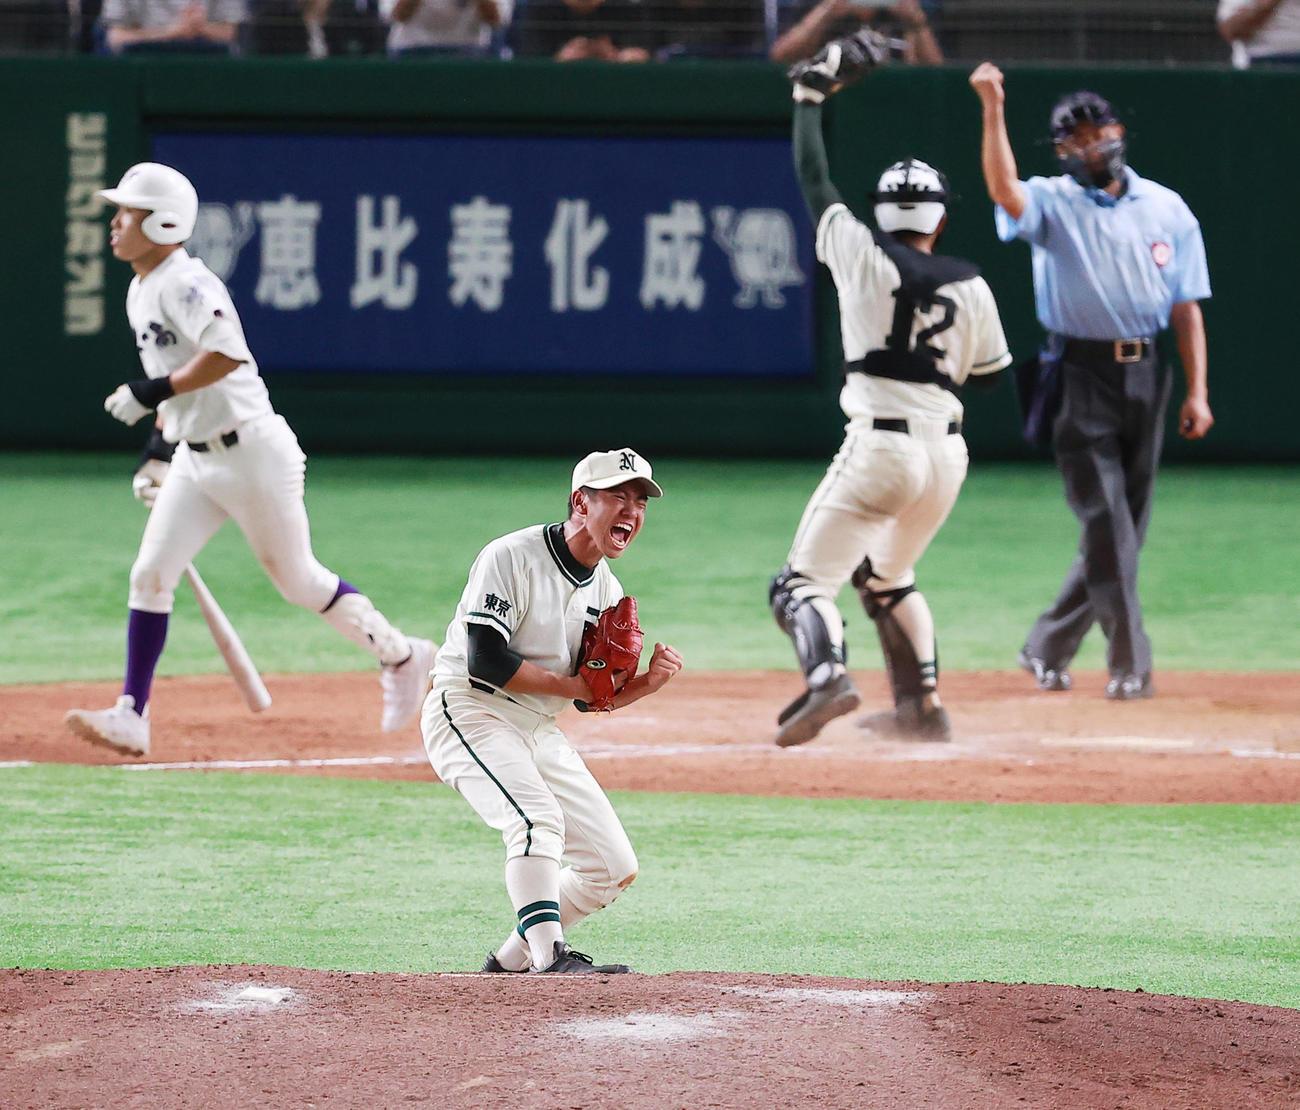 二松学舎大付対関東第一 優勝を決めて喜ぶ二松学舎大付・秋山(撮影・野上伸悟)